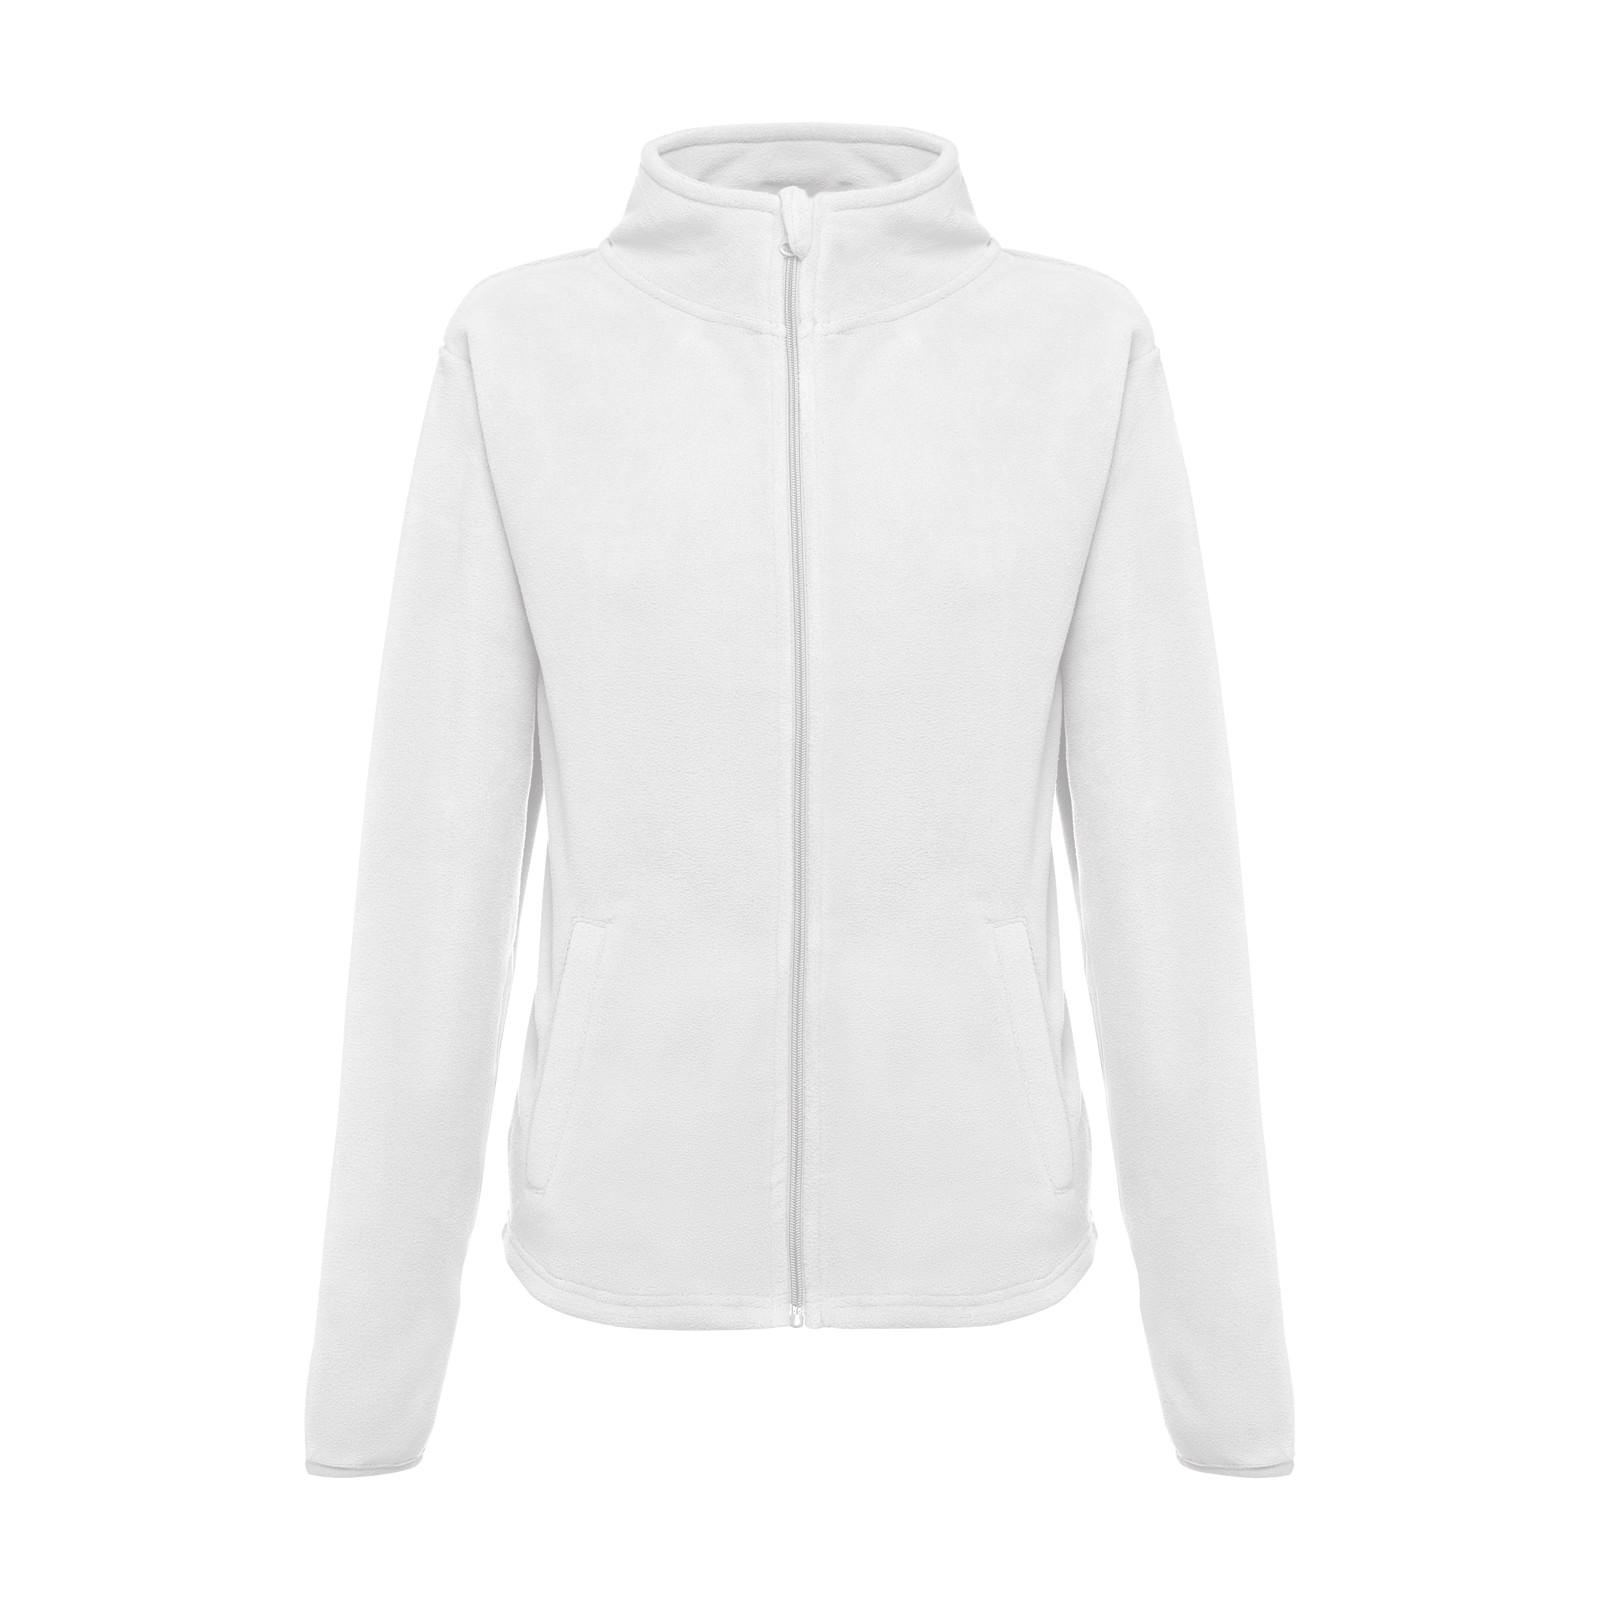 HELSINKI WOMEN. Dámská fleecová bunda - Bílá / S